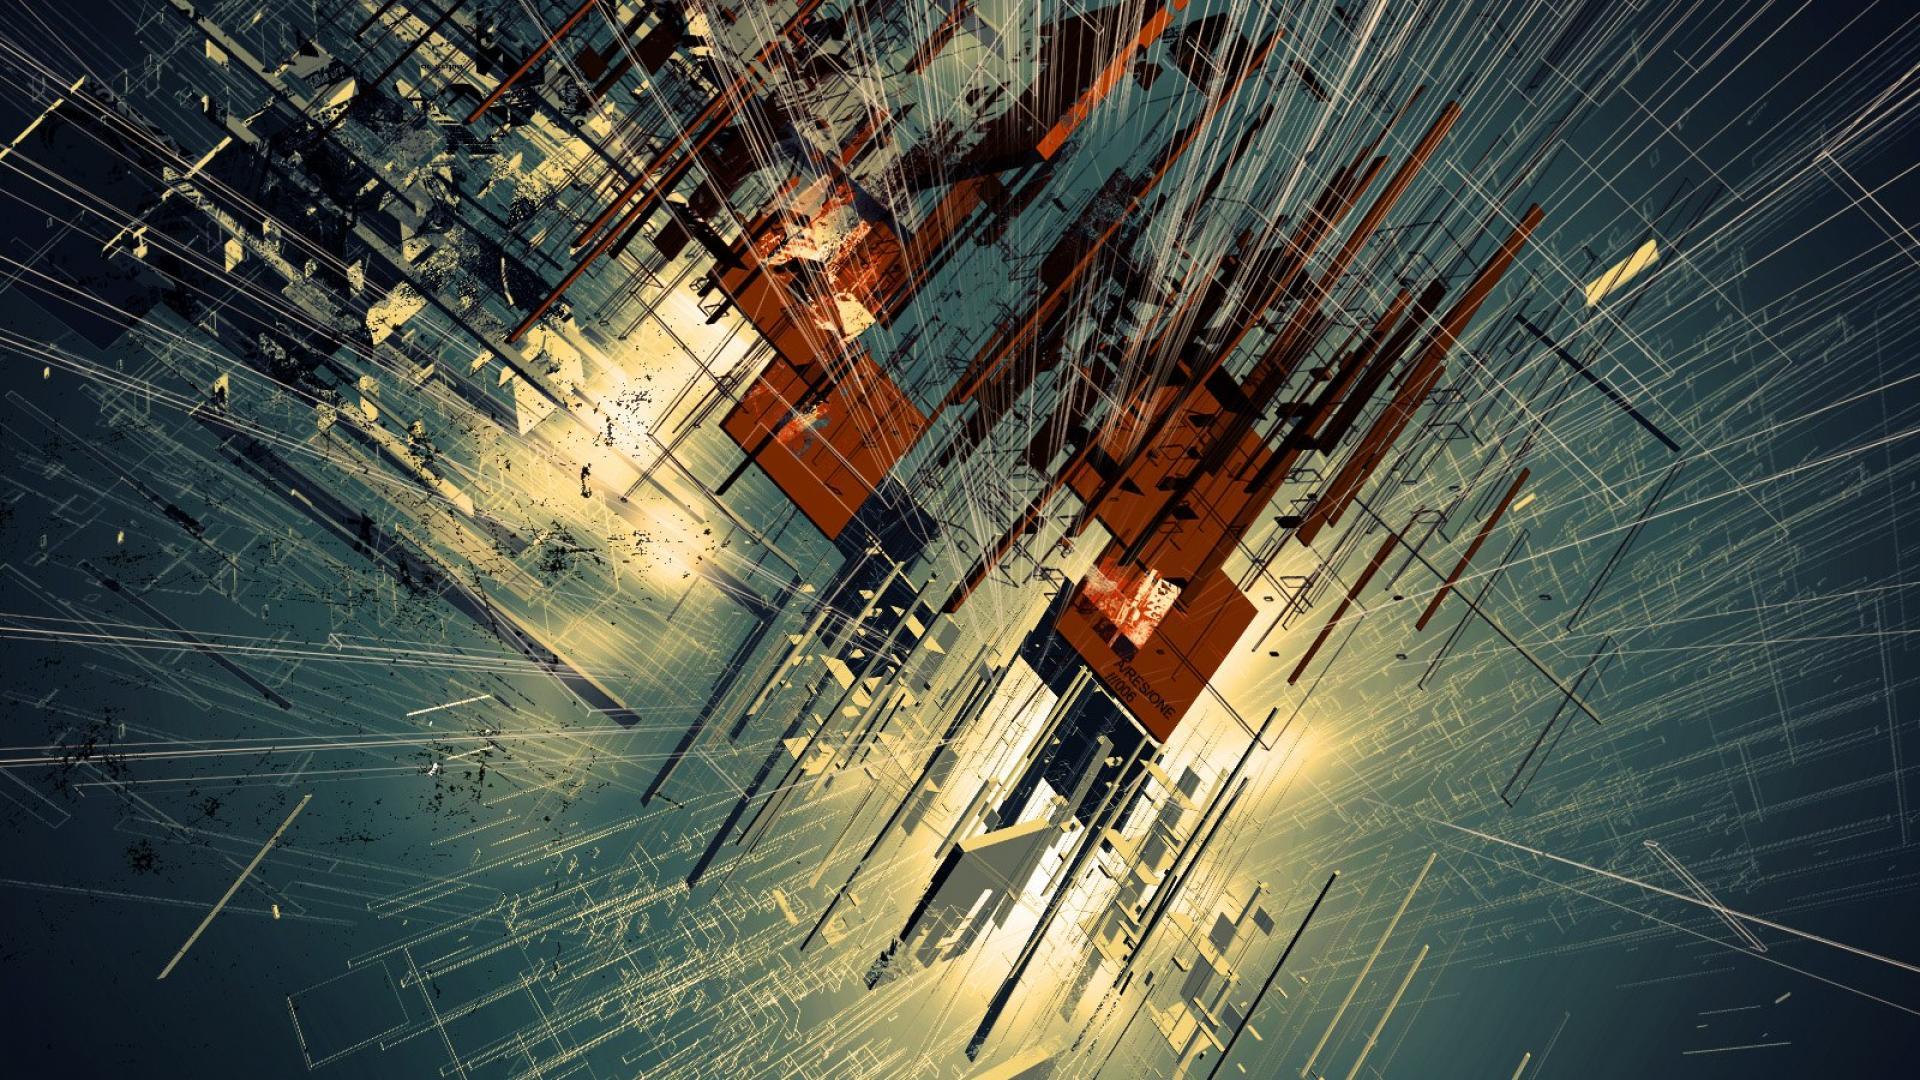 Space Abstract Wallpapers 4k 1920x1080 Download Hd Wallpaper Wallpapertip